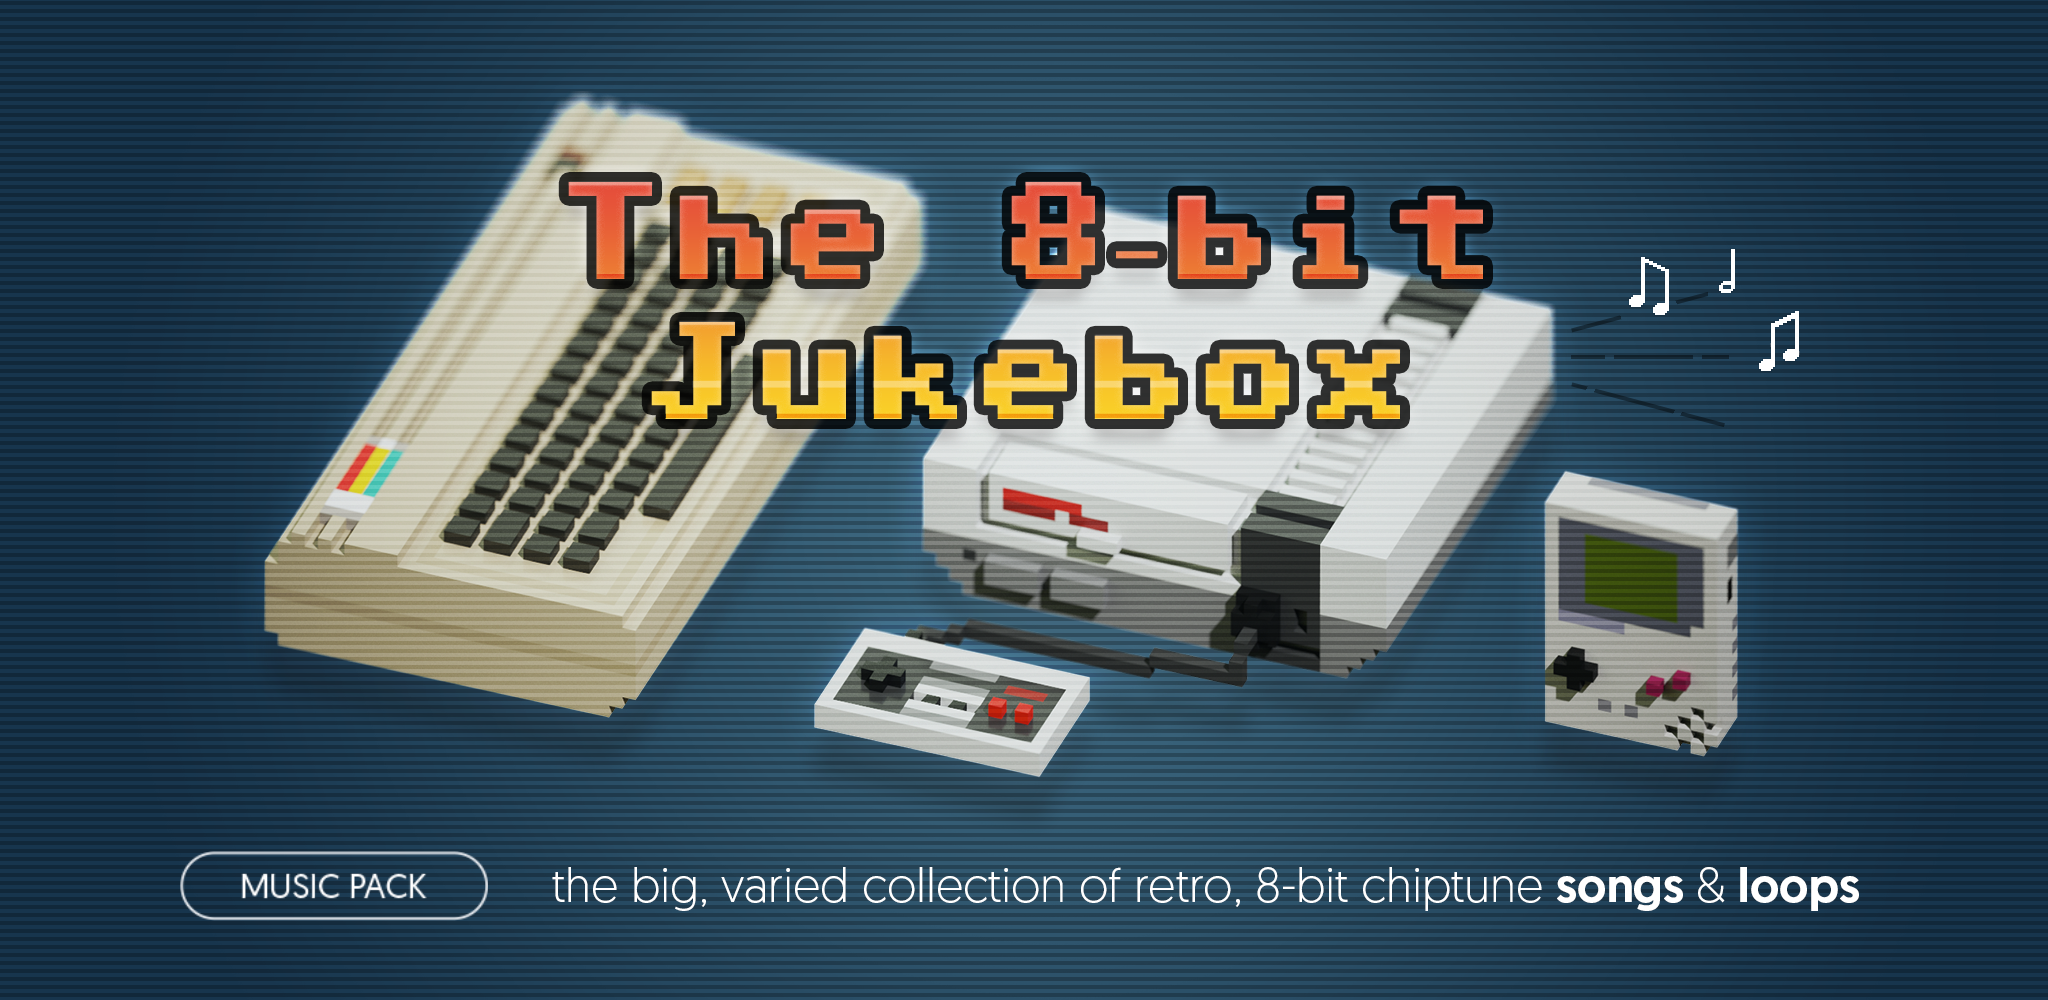 The 8-bit Jukebox - music pack